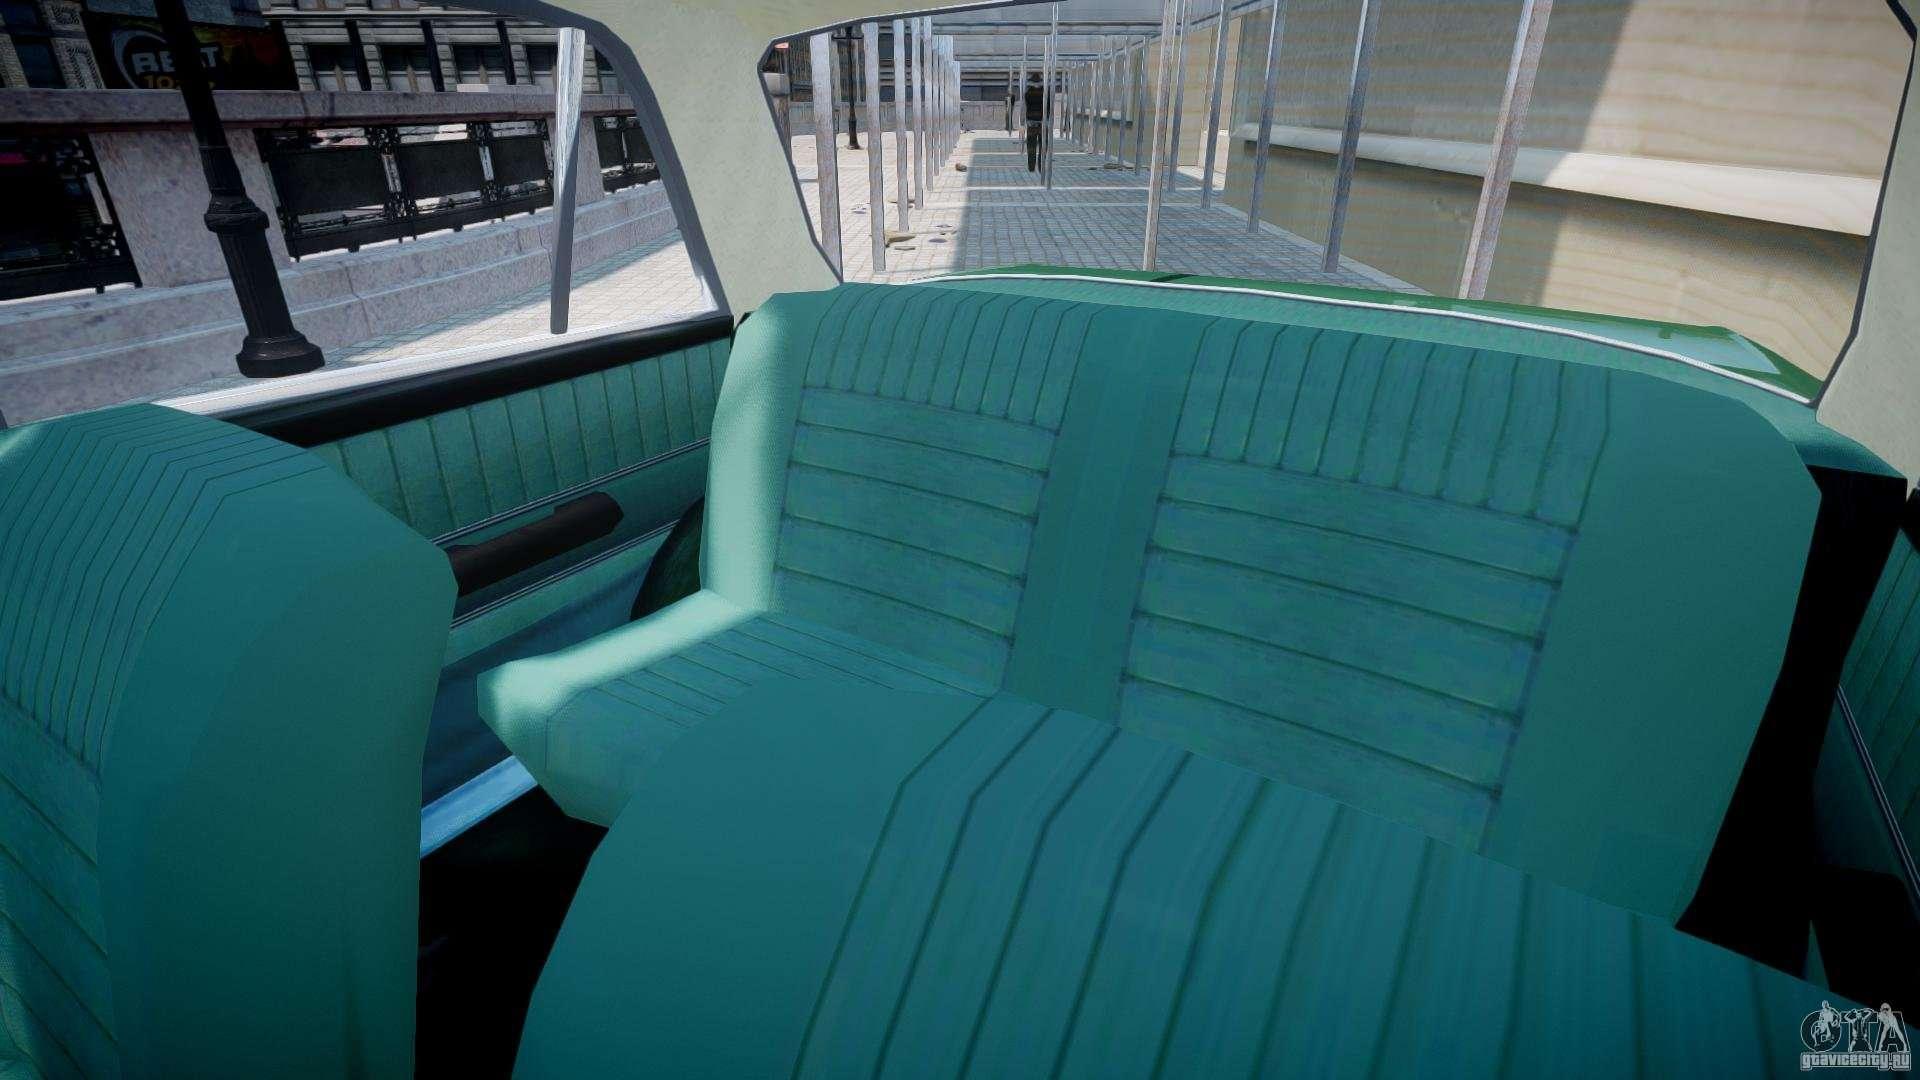 polski fiat 125p interior with 14985 Fiat 125p Polski 1970 on TXM4r 5Ft7k further Wagon Wednesday 1977 Polski Fiat 125p Kombi 4x4 Prototype besides Re 1963 Wildcat Conv 4 Speed likewise 1985 Fiat 125p Sedan likewise 14985 Fiat 125p Polski 1970.